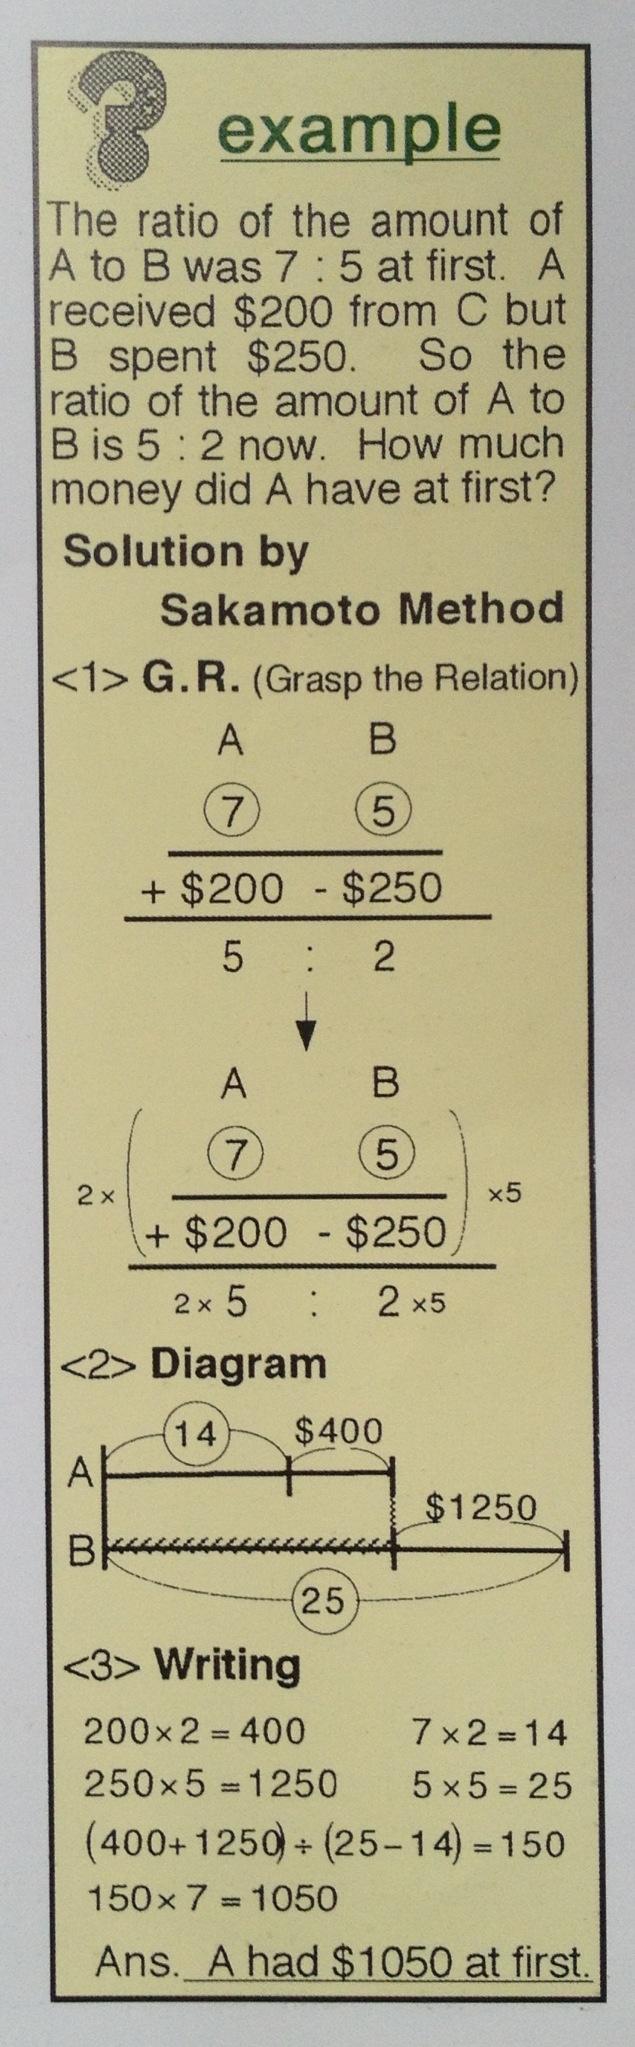 singapore math word problems grade 3 pdf